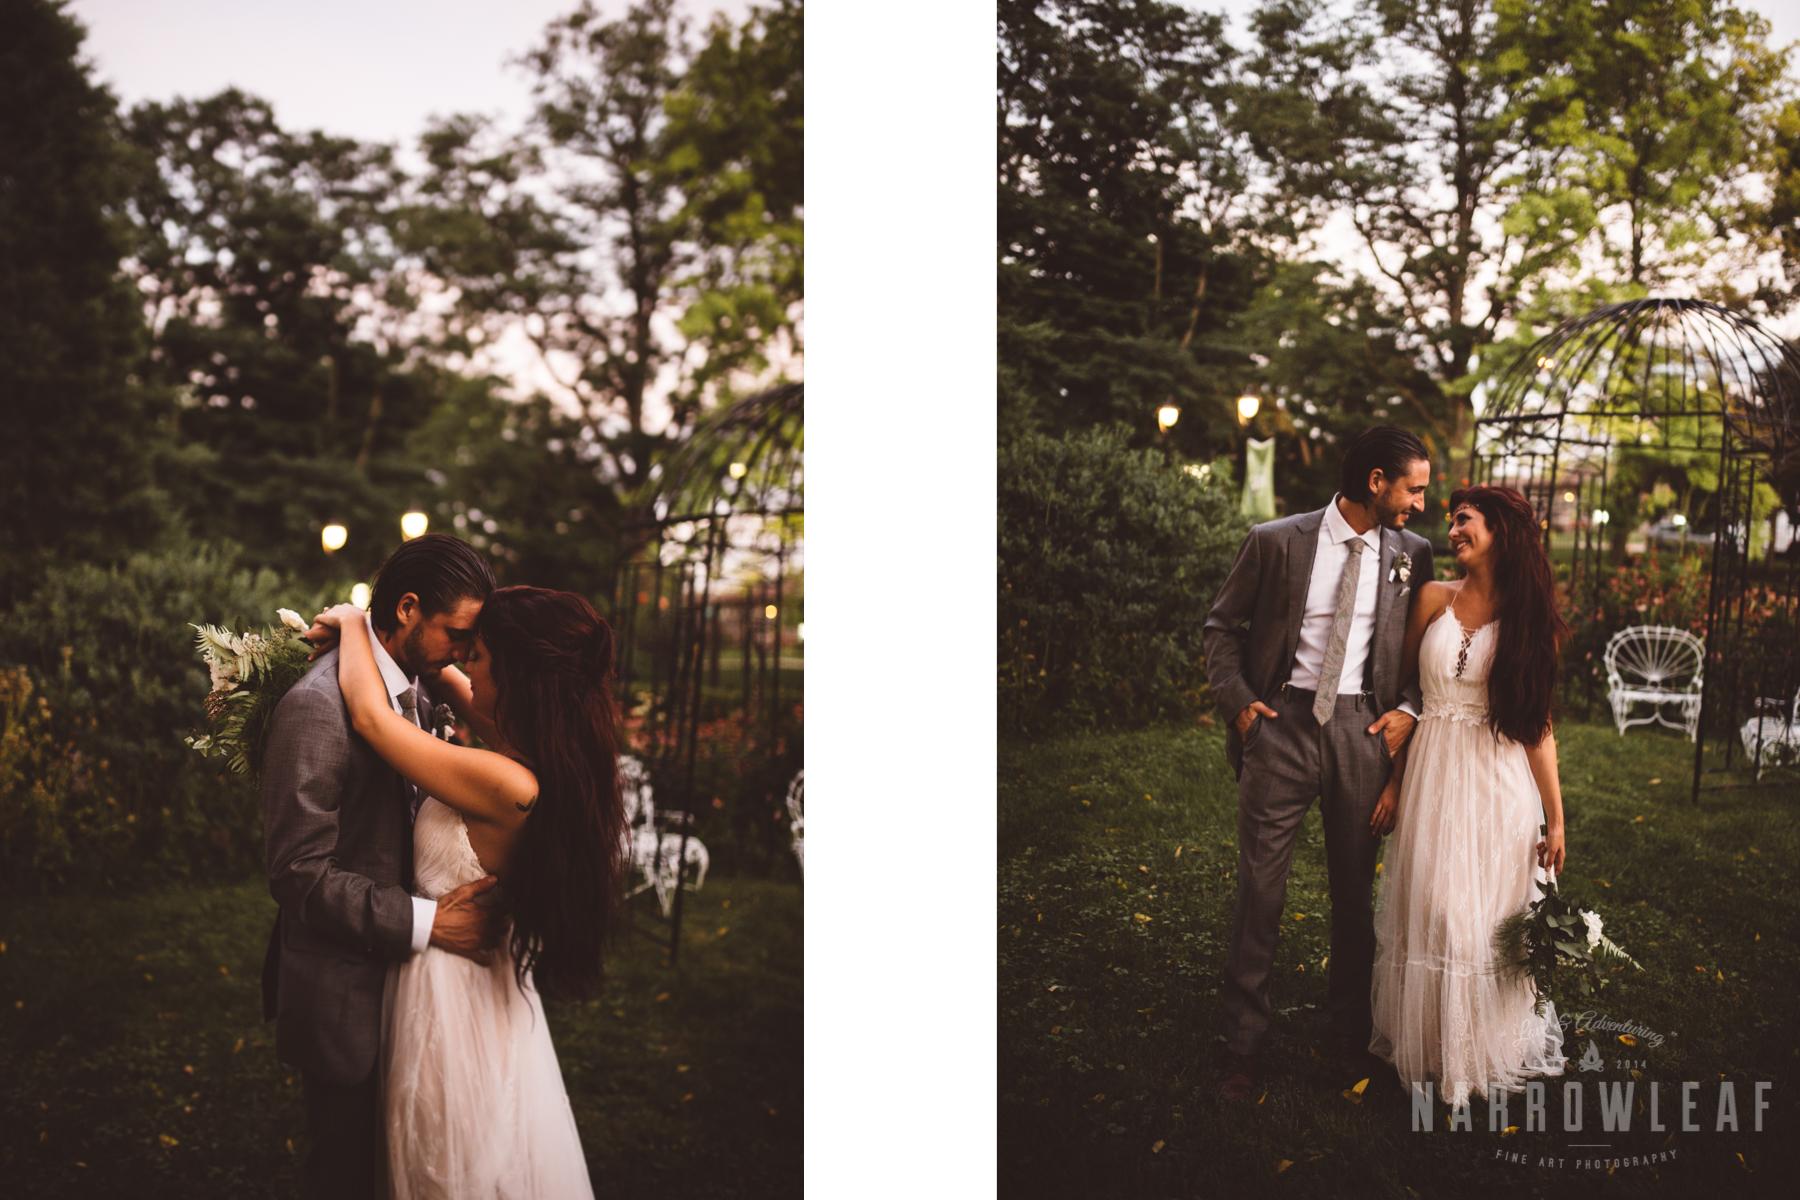 Lake-Geneva-Wisconsin-Wedding-sunset-bride-groom-romantic.jpg